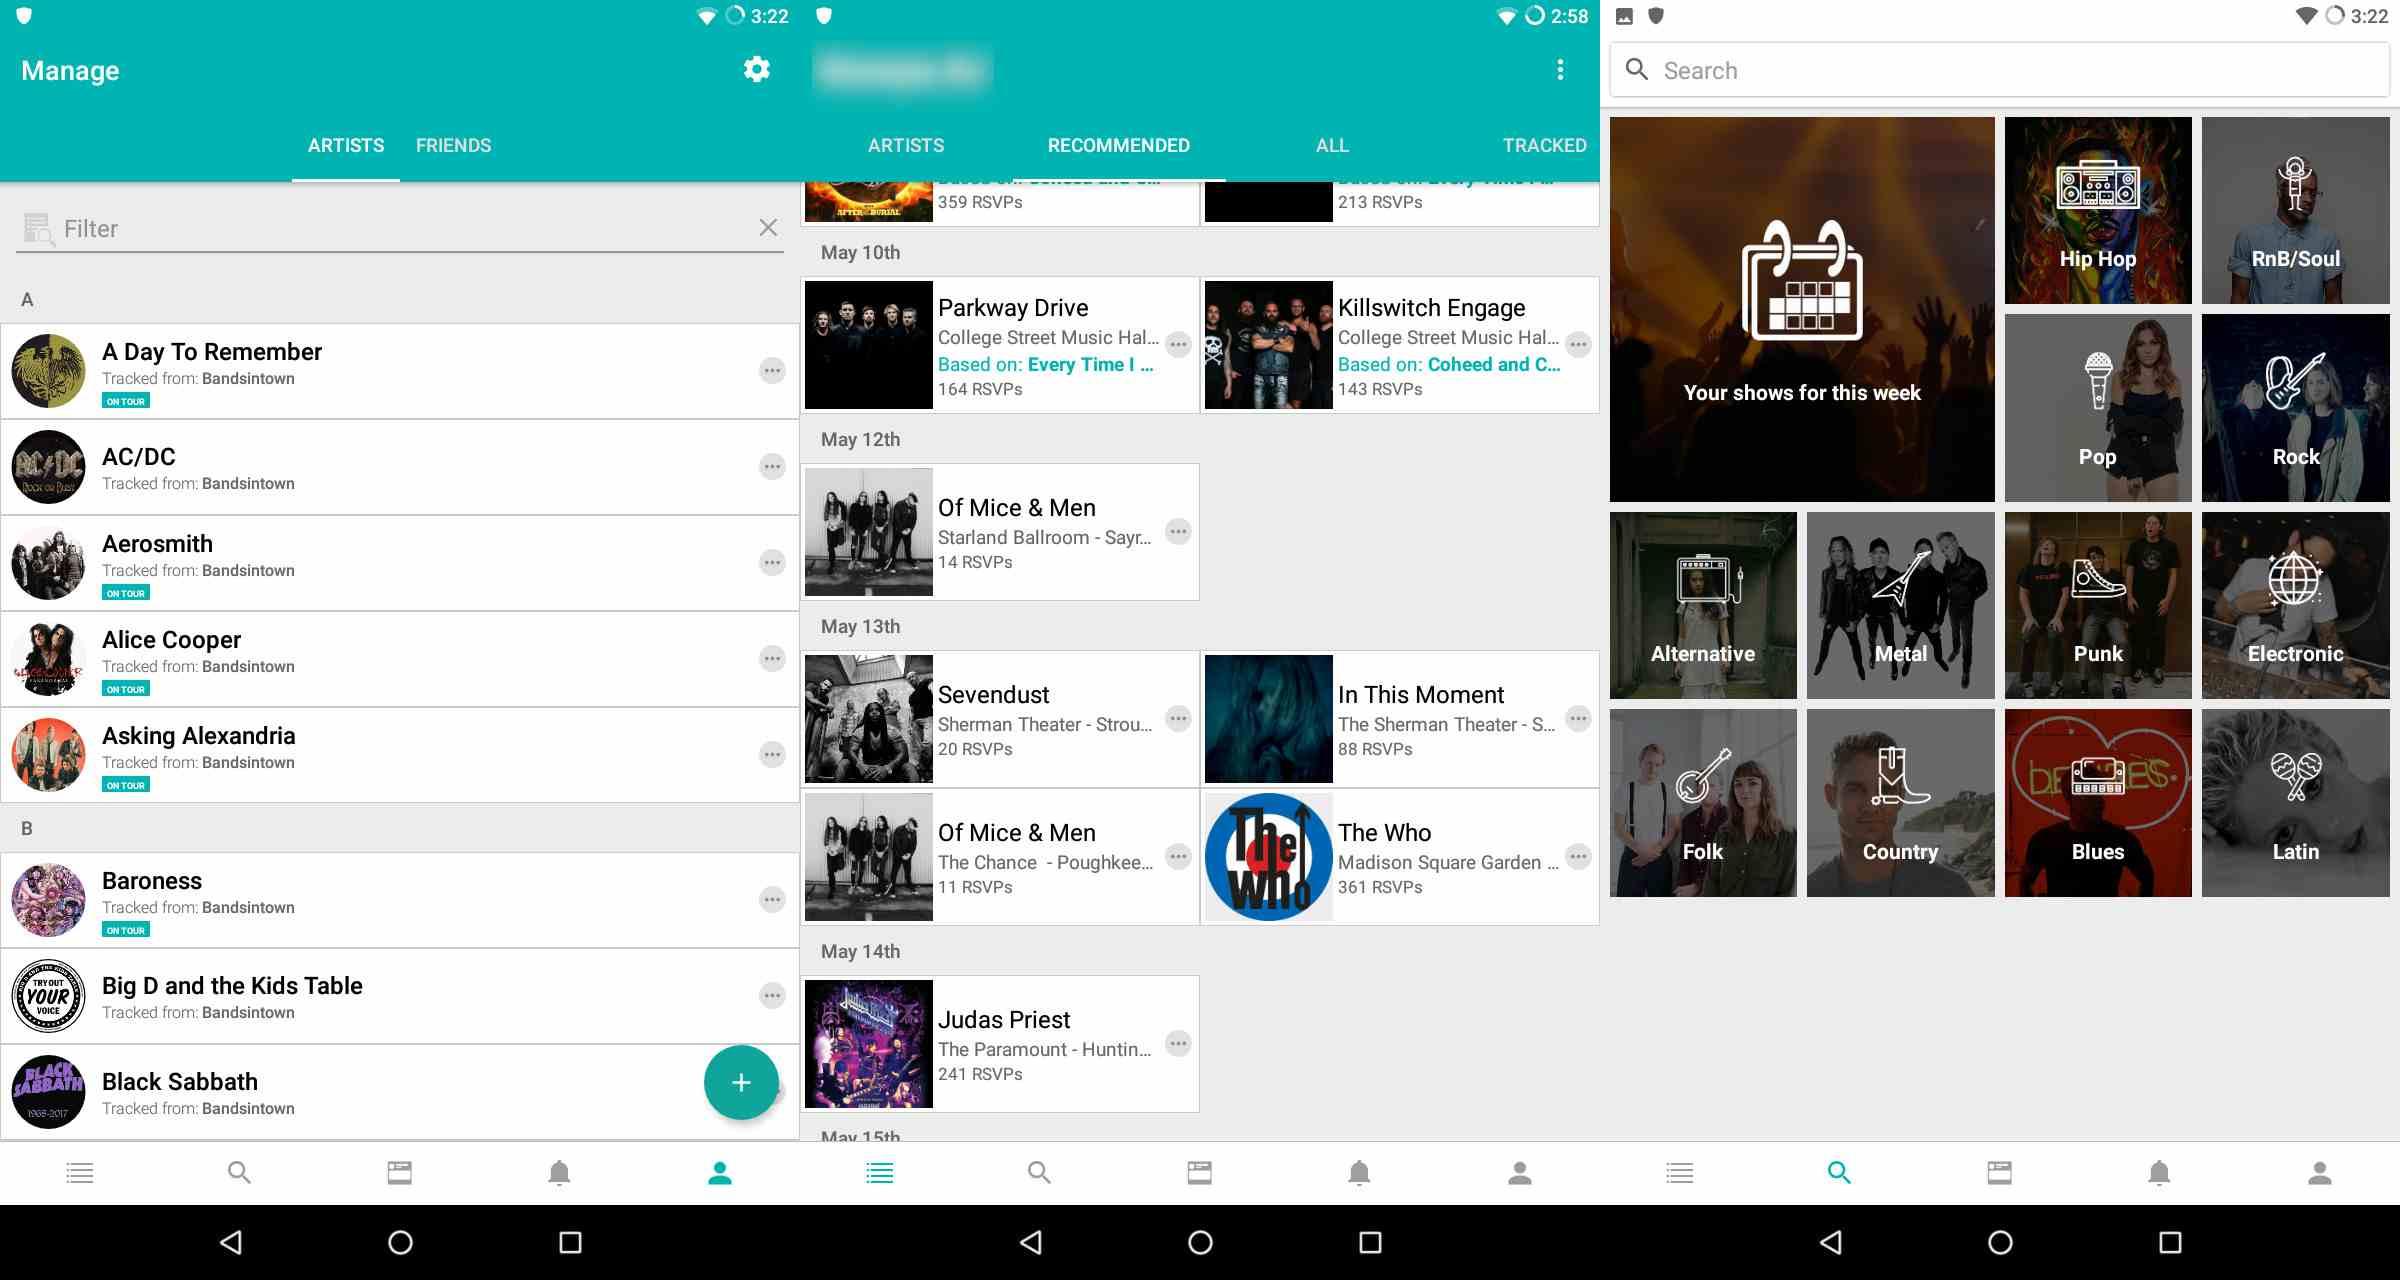 The 4 Best Concert Apps of 2019